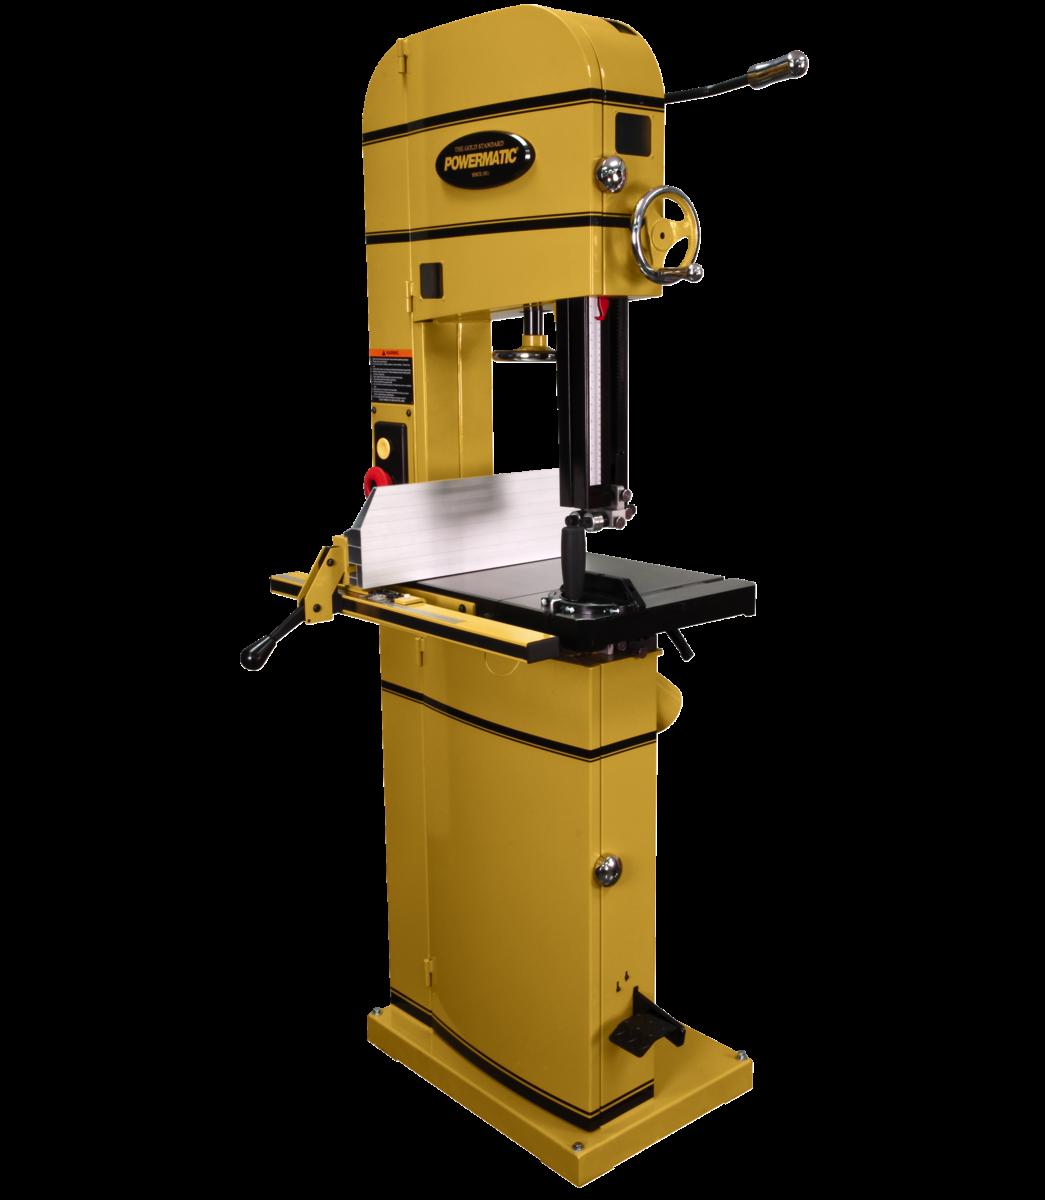 PM1500 Bandsaw, 3HP 1PH 230V